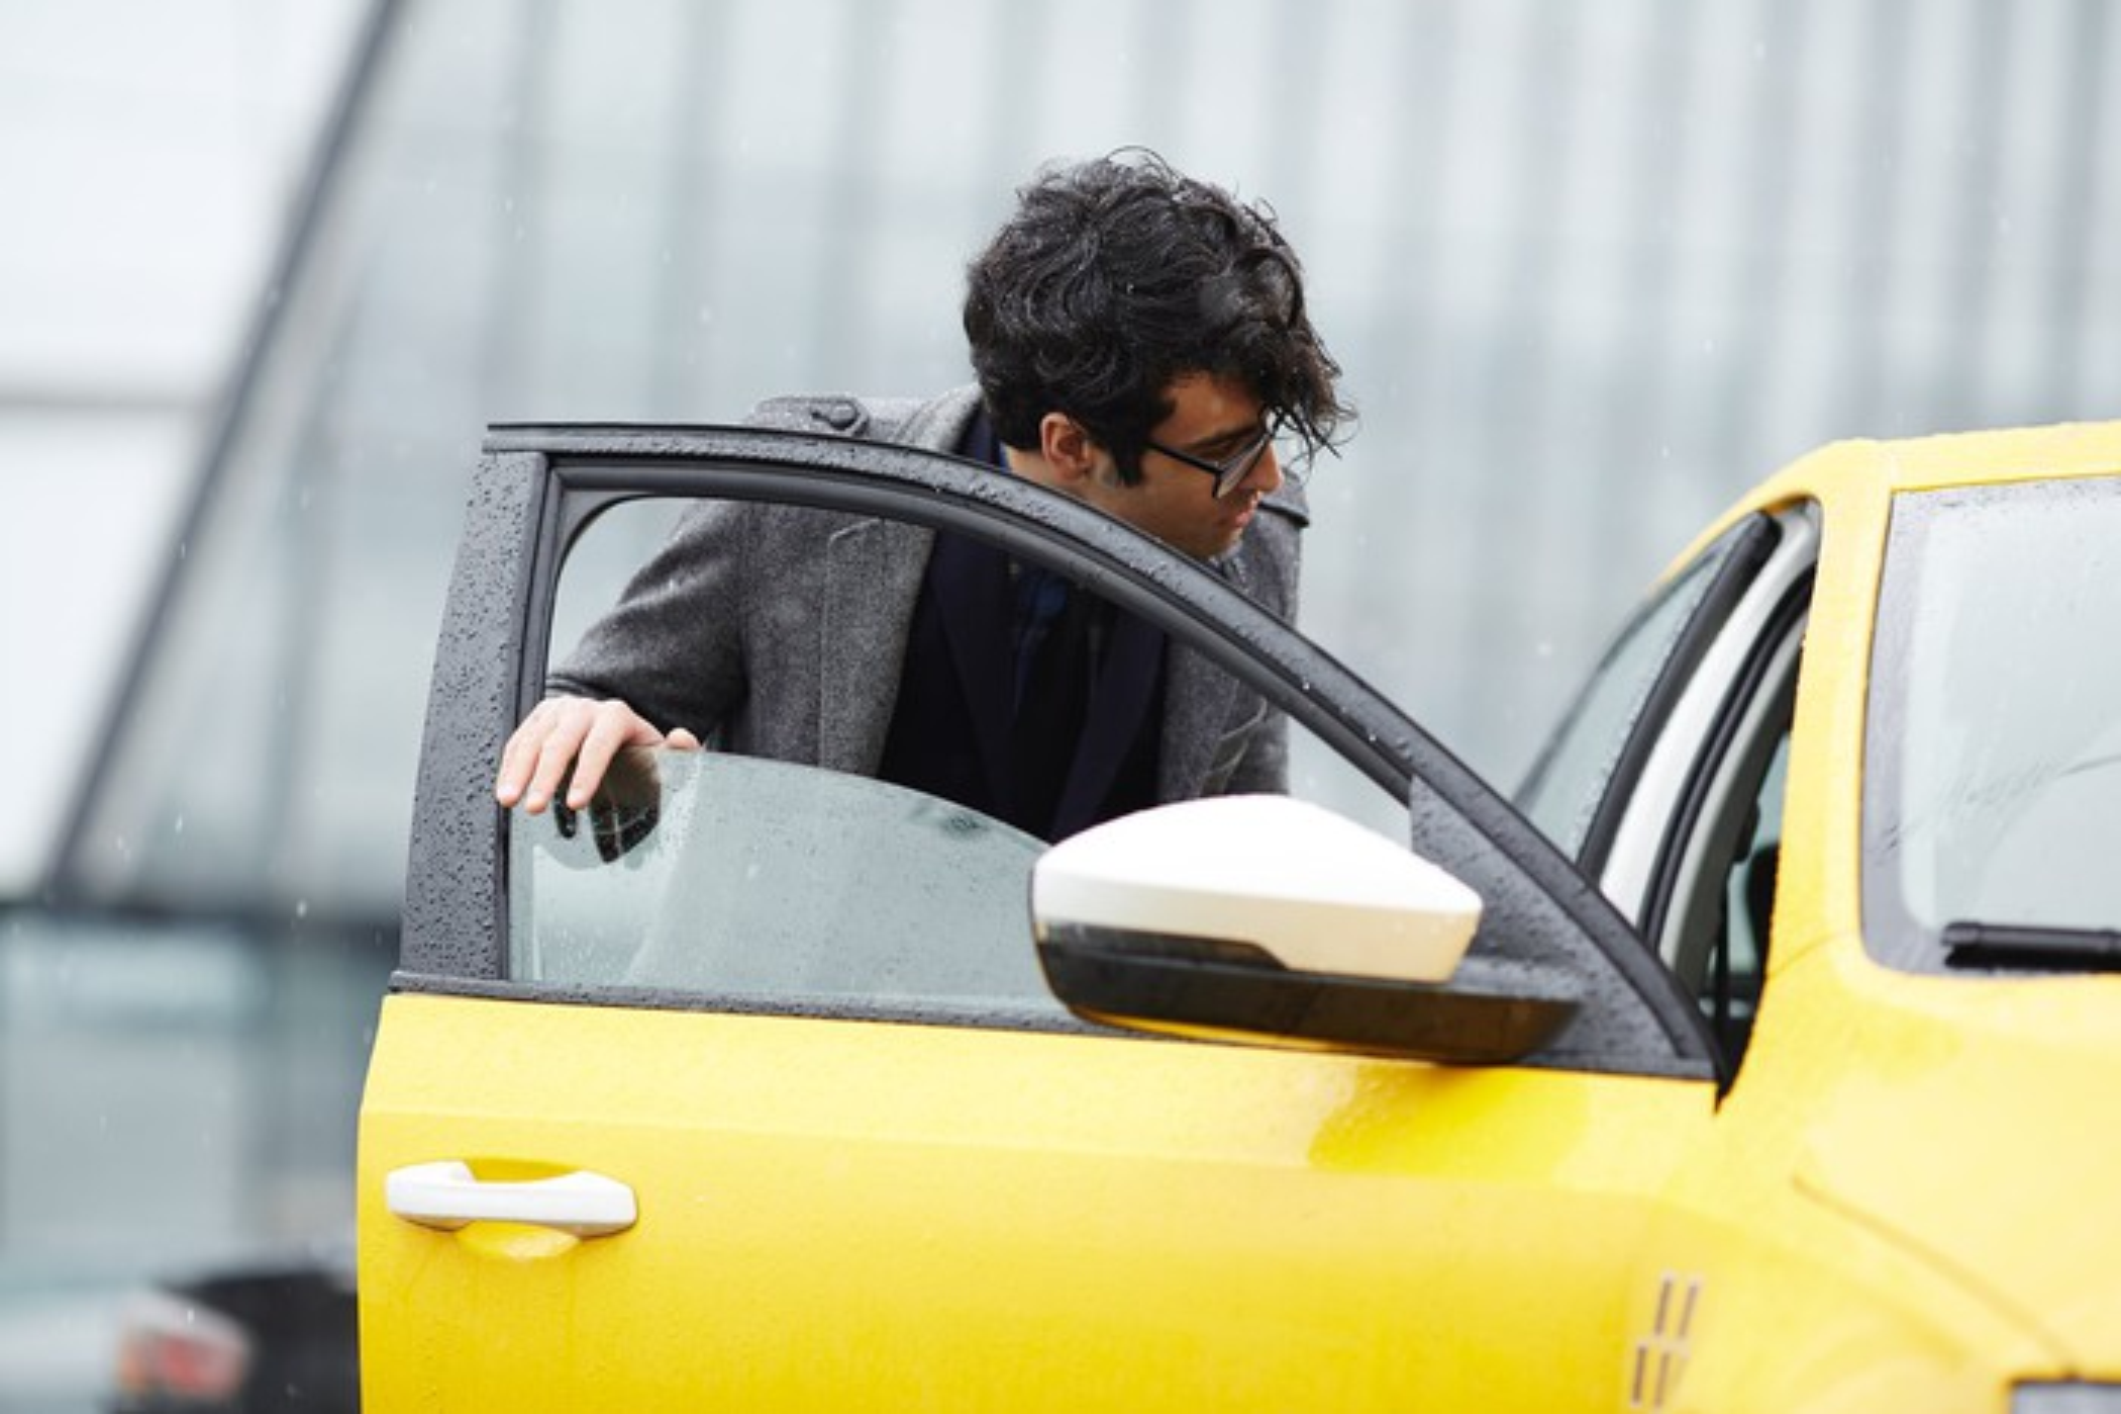 A man gets into a taxi.